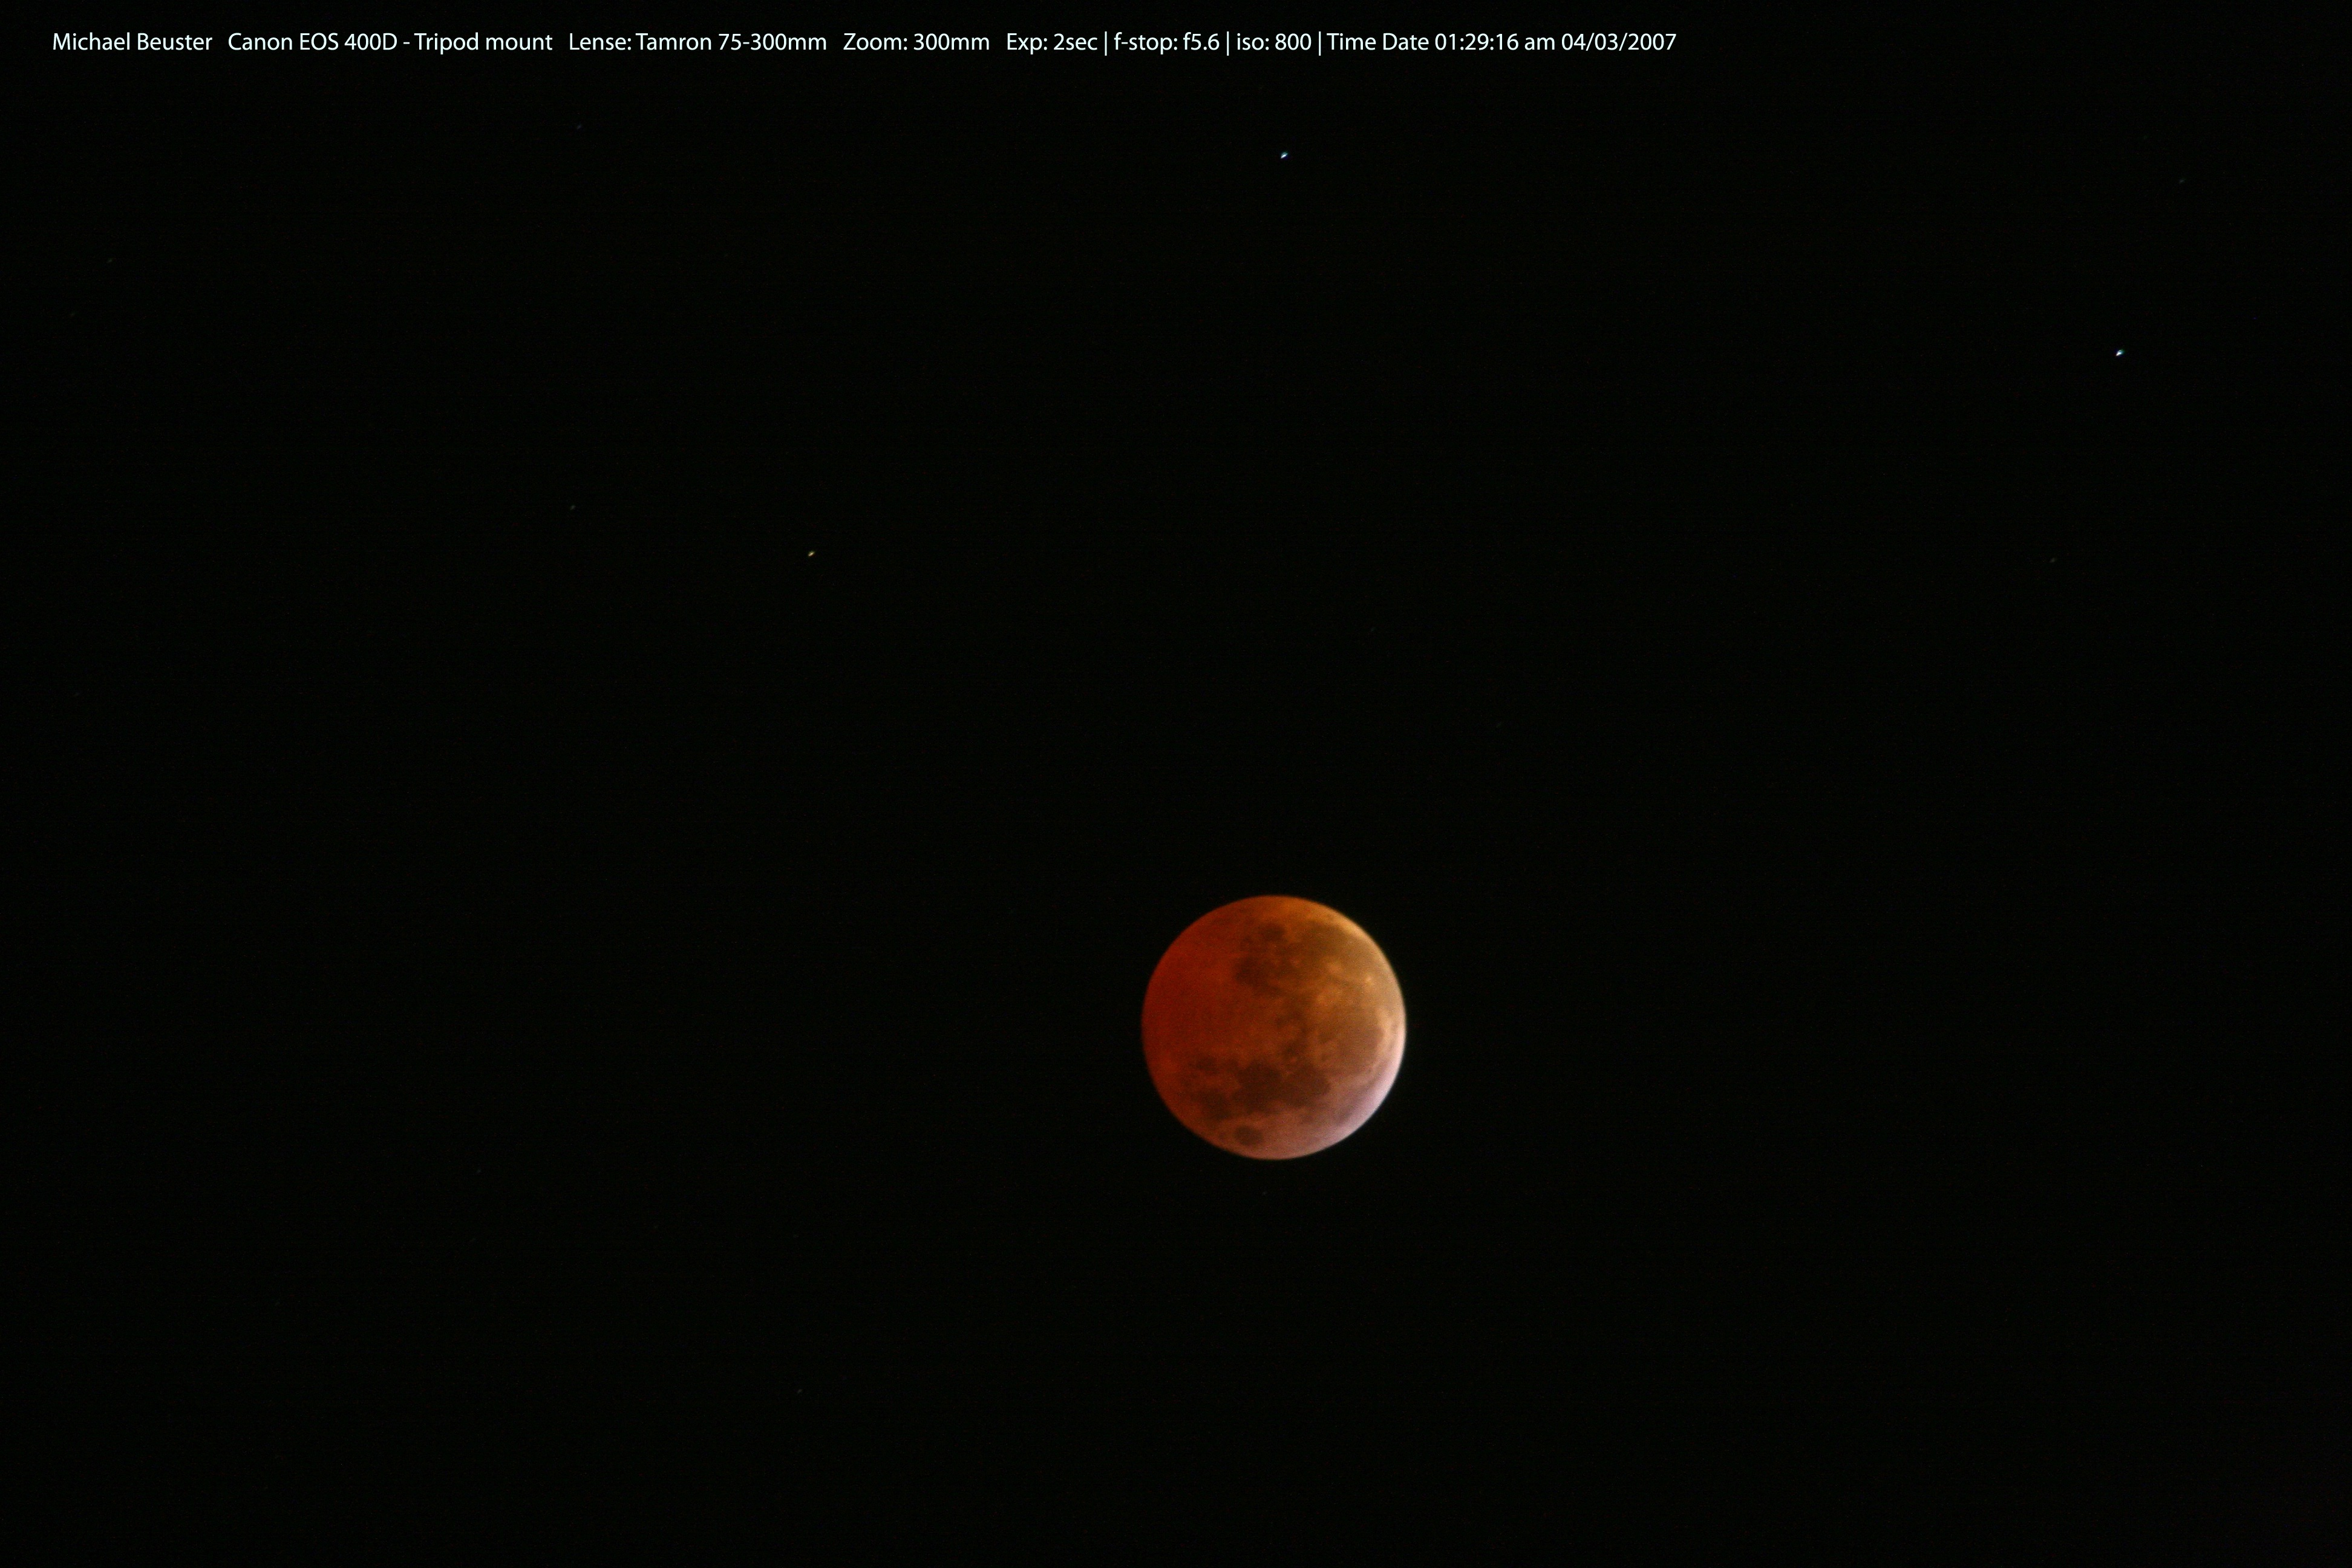 1567218218683-Lunar-Eclipse_South-Africa.jpg